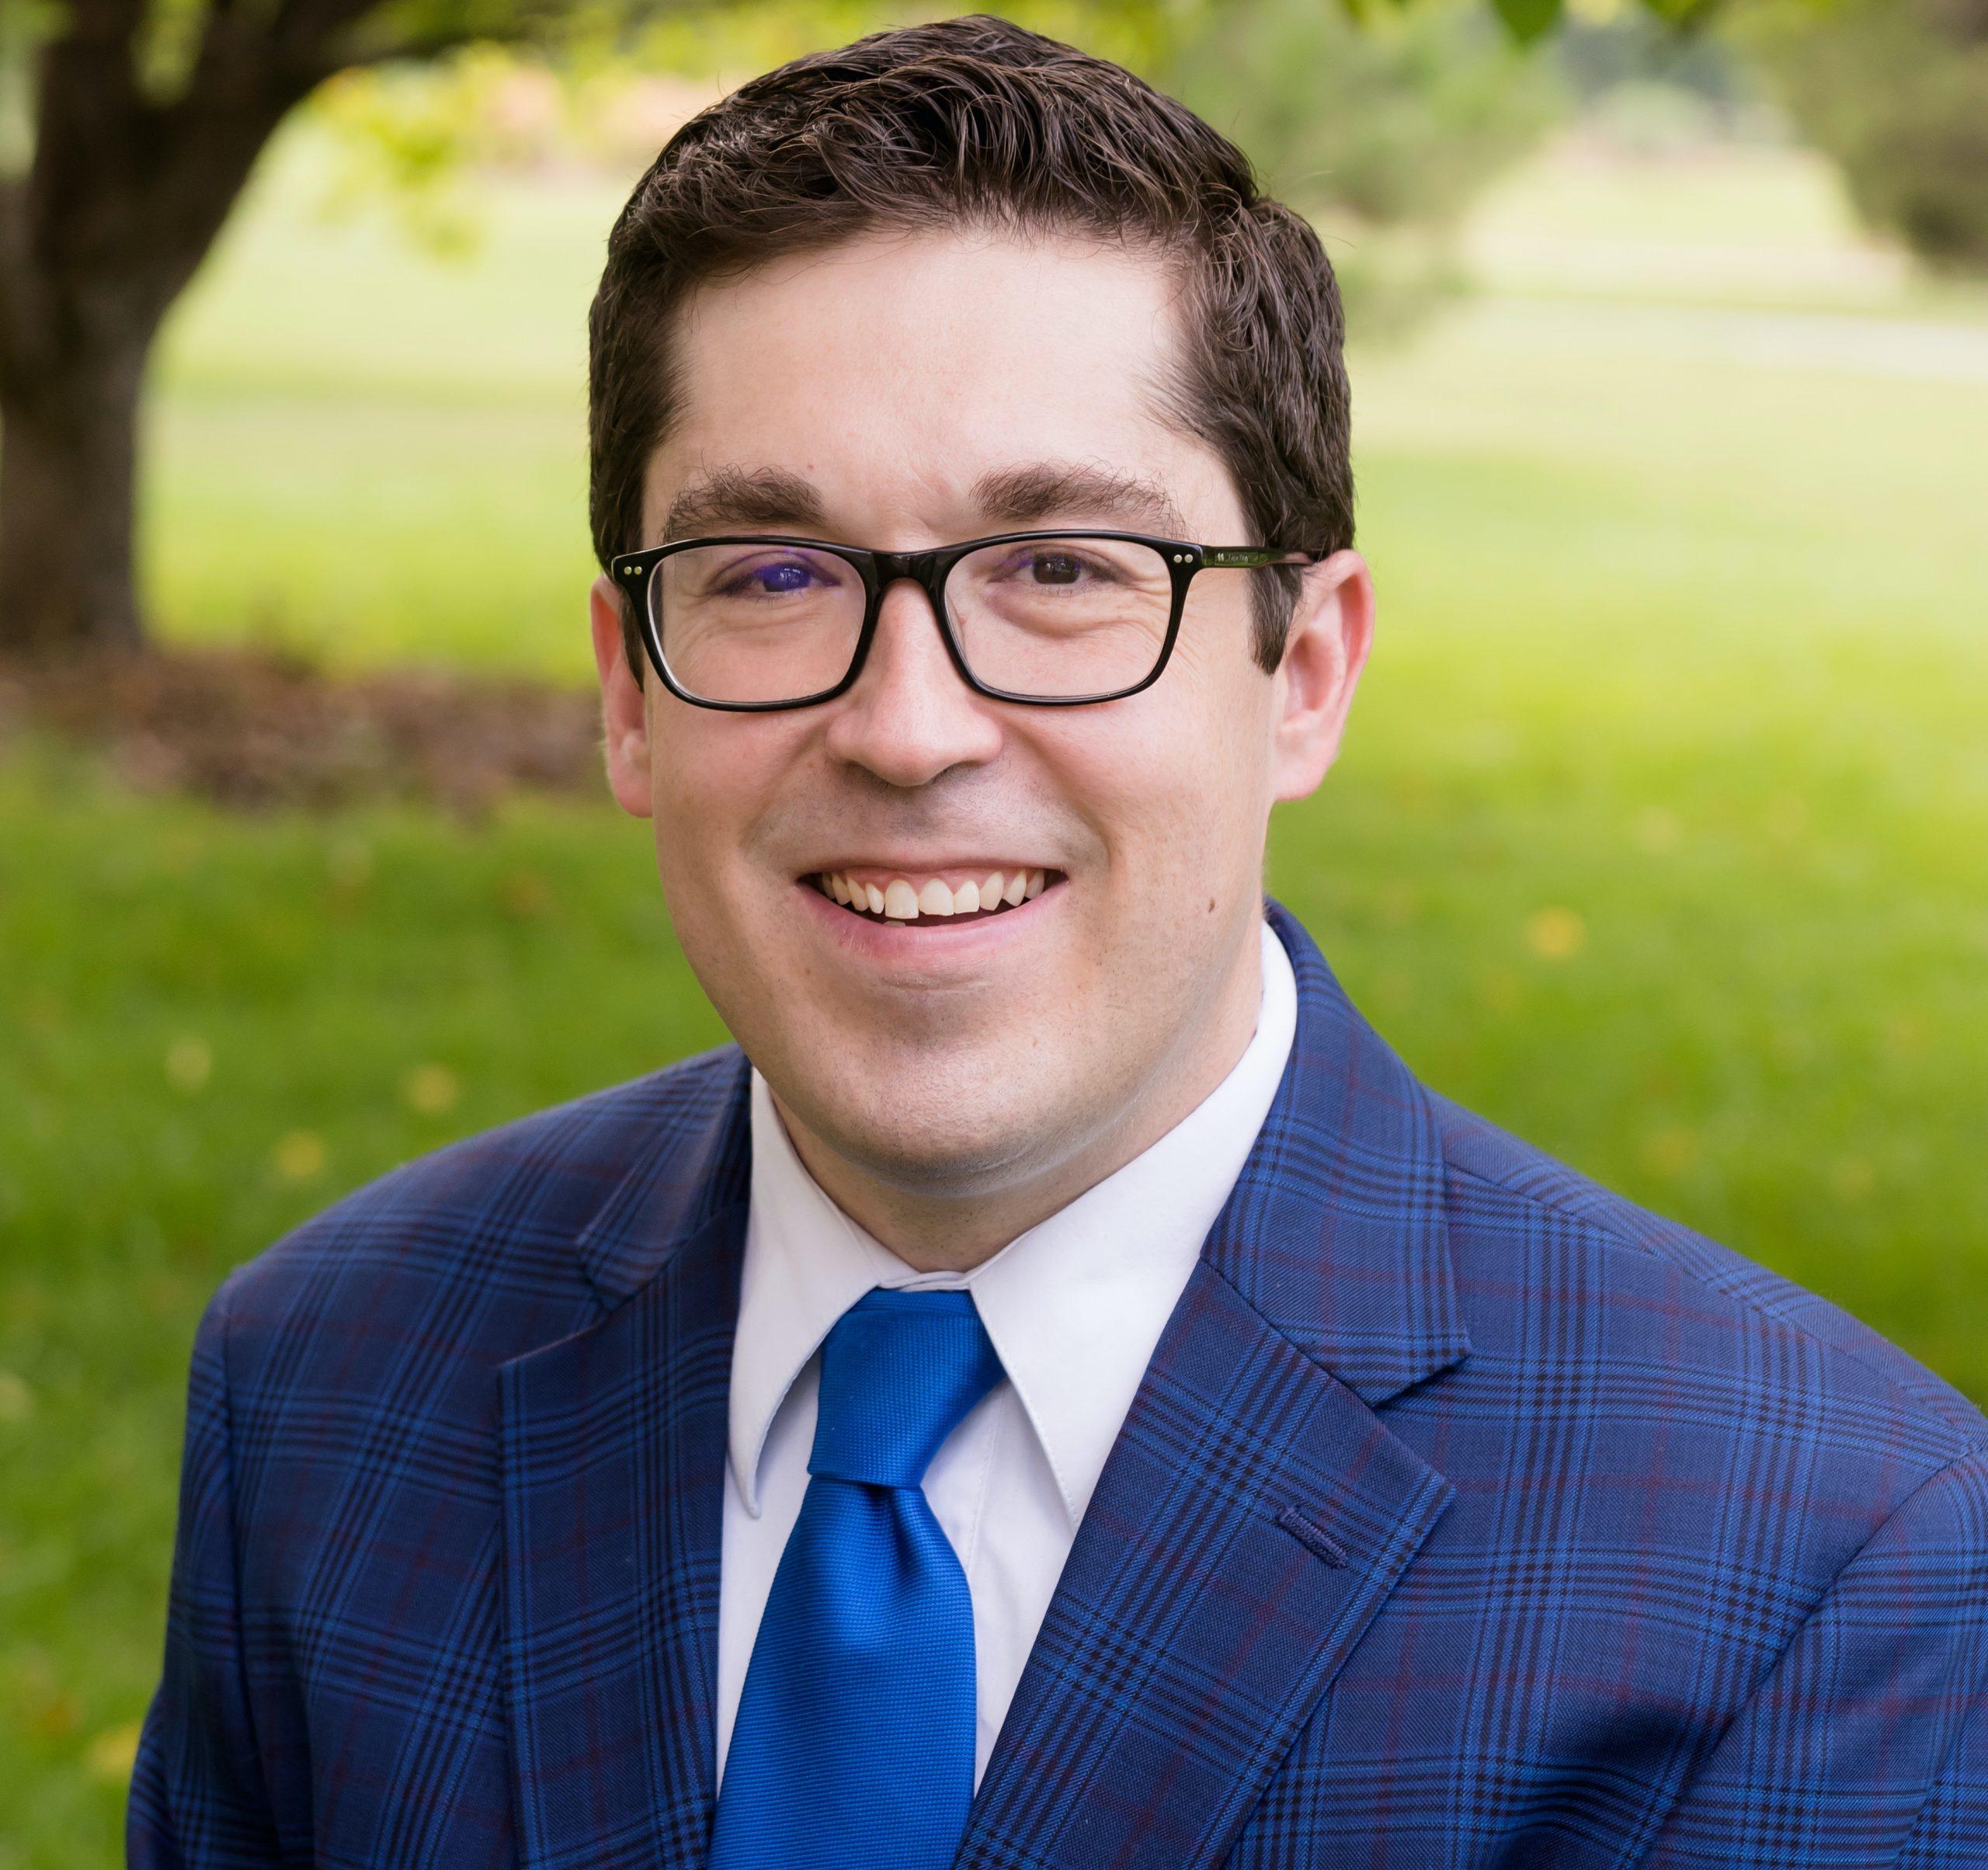 Elliot Goldbaum